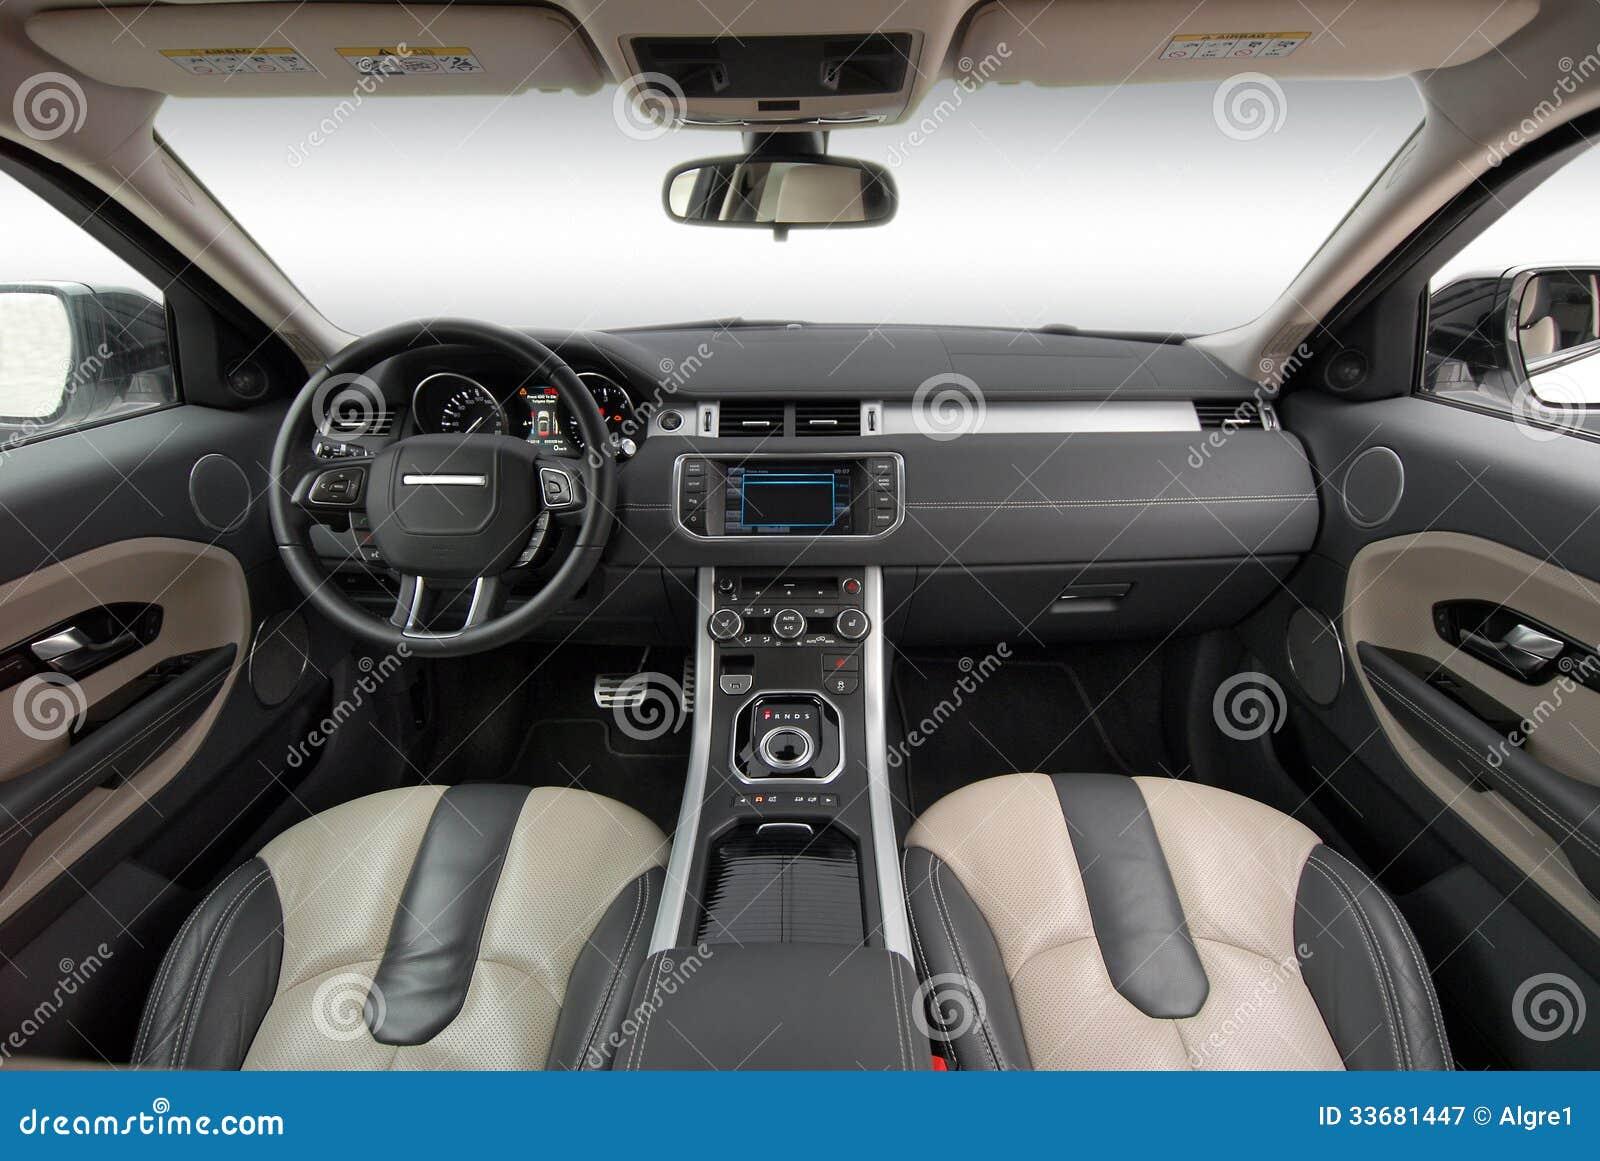 car interior stock image image of expensive automobile 33681447. Black Bedroom Furniture Sets. Home Design Ideas